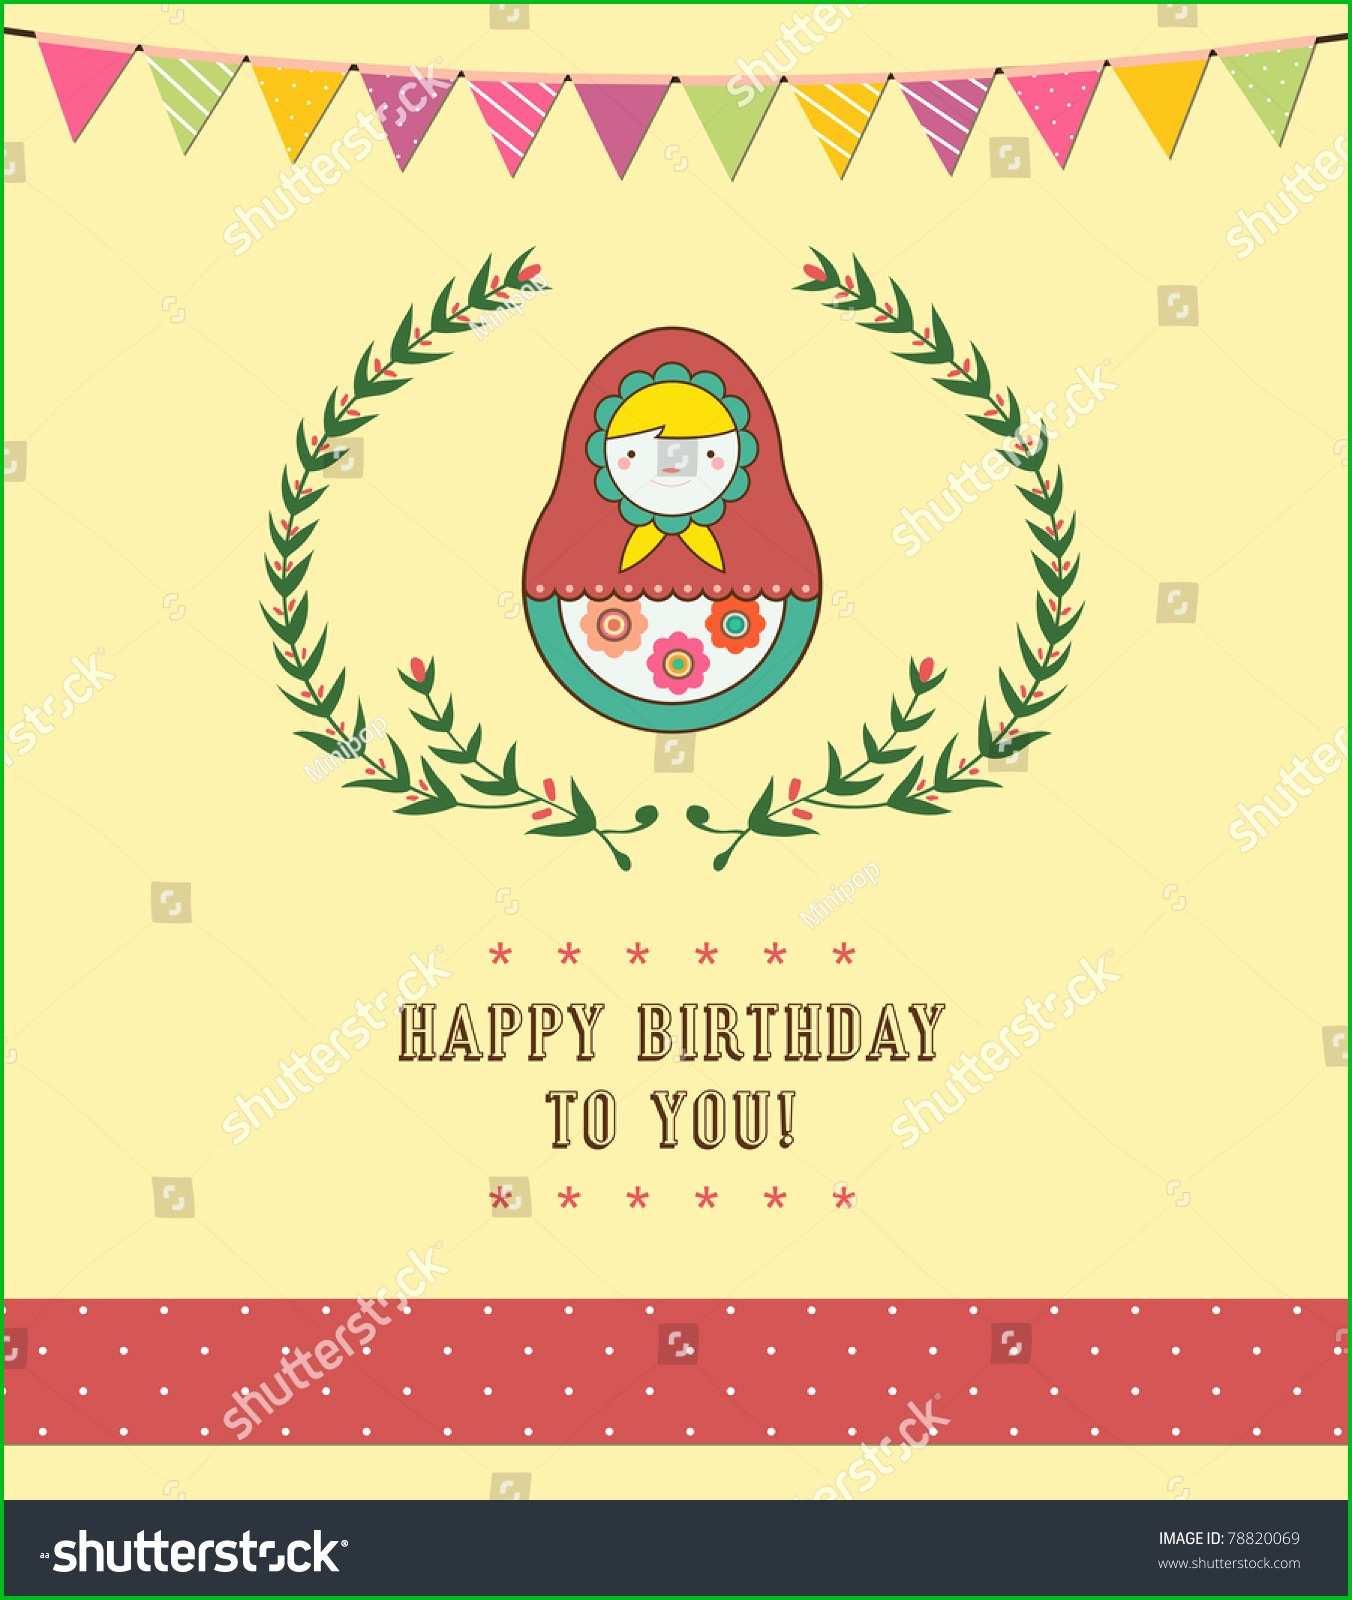 Russian Birthday Cards Unique 44 Russian Birthday Wishes | Birthday - Free Printable Russian Birthday Cards